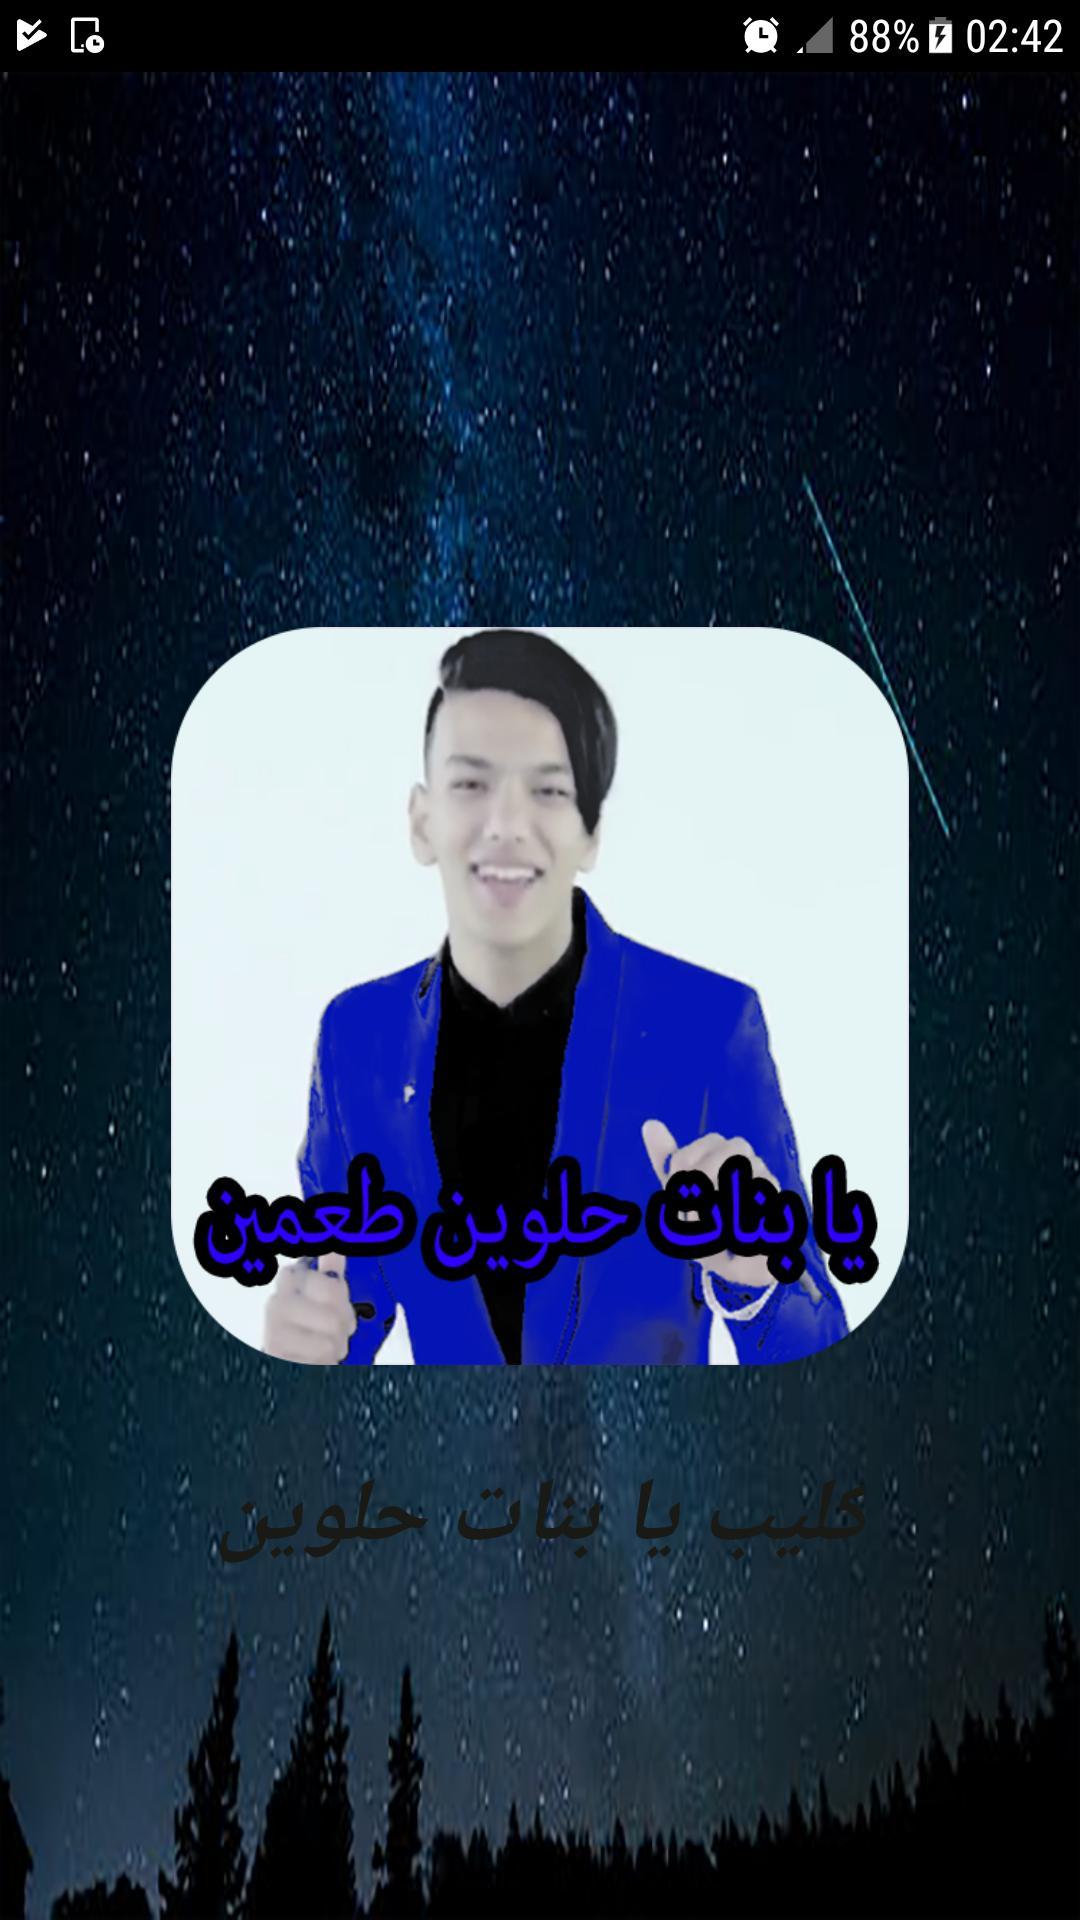 اغنية يابنات حلوين طعمين بدون نت For Android Apk Download